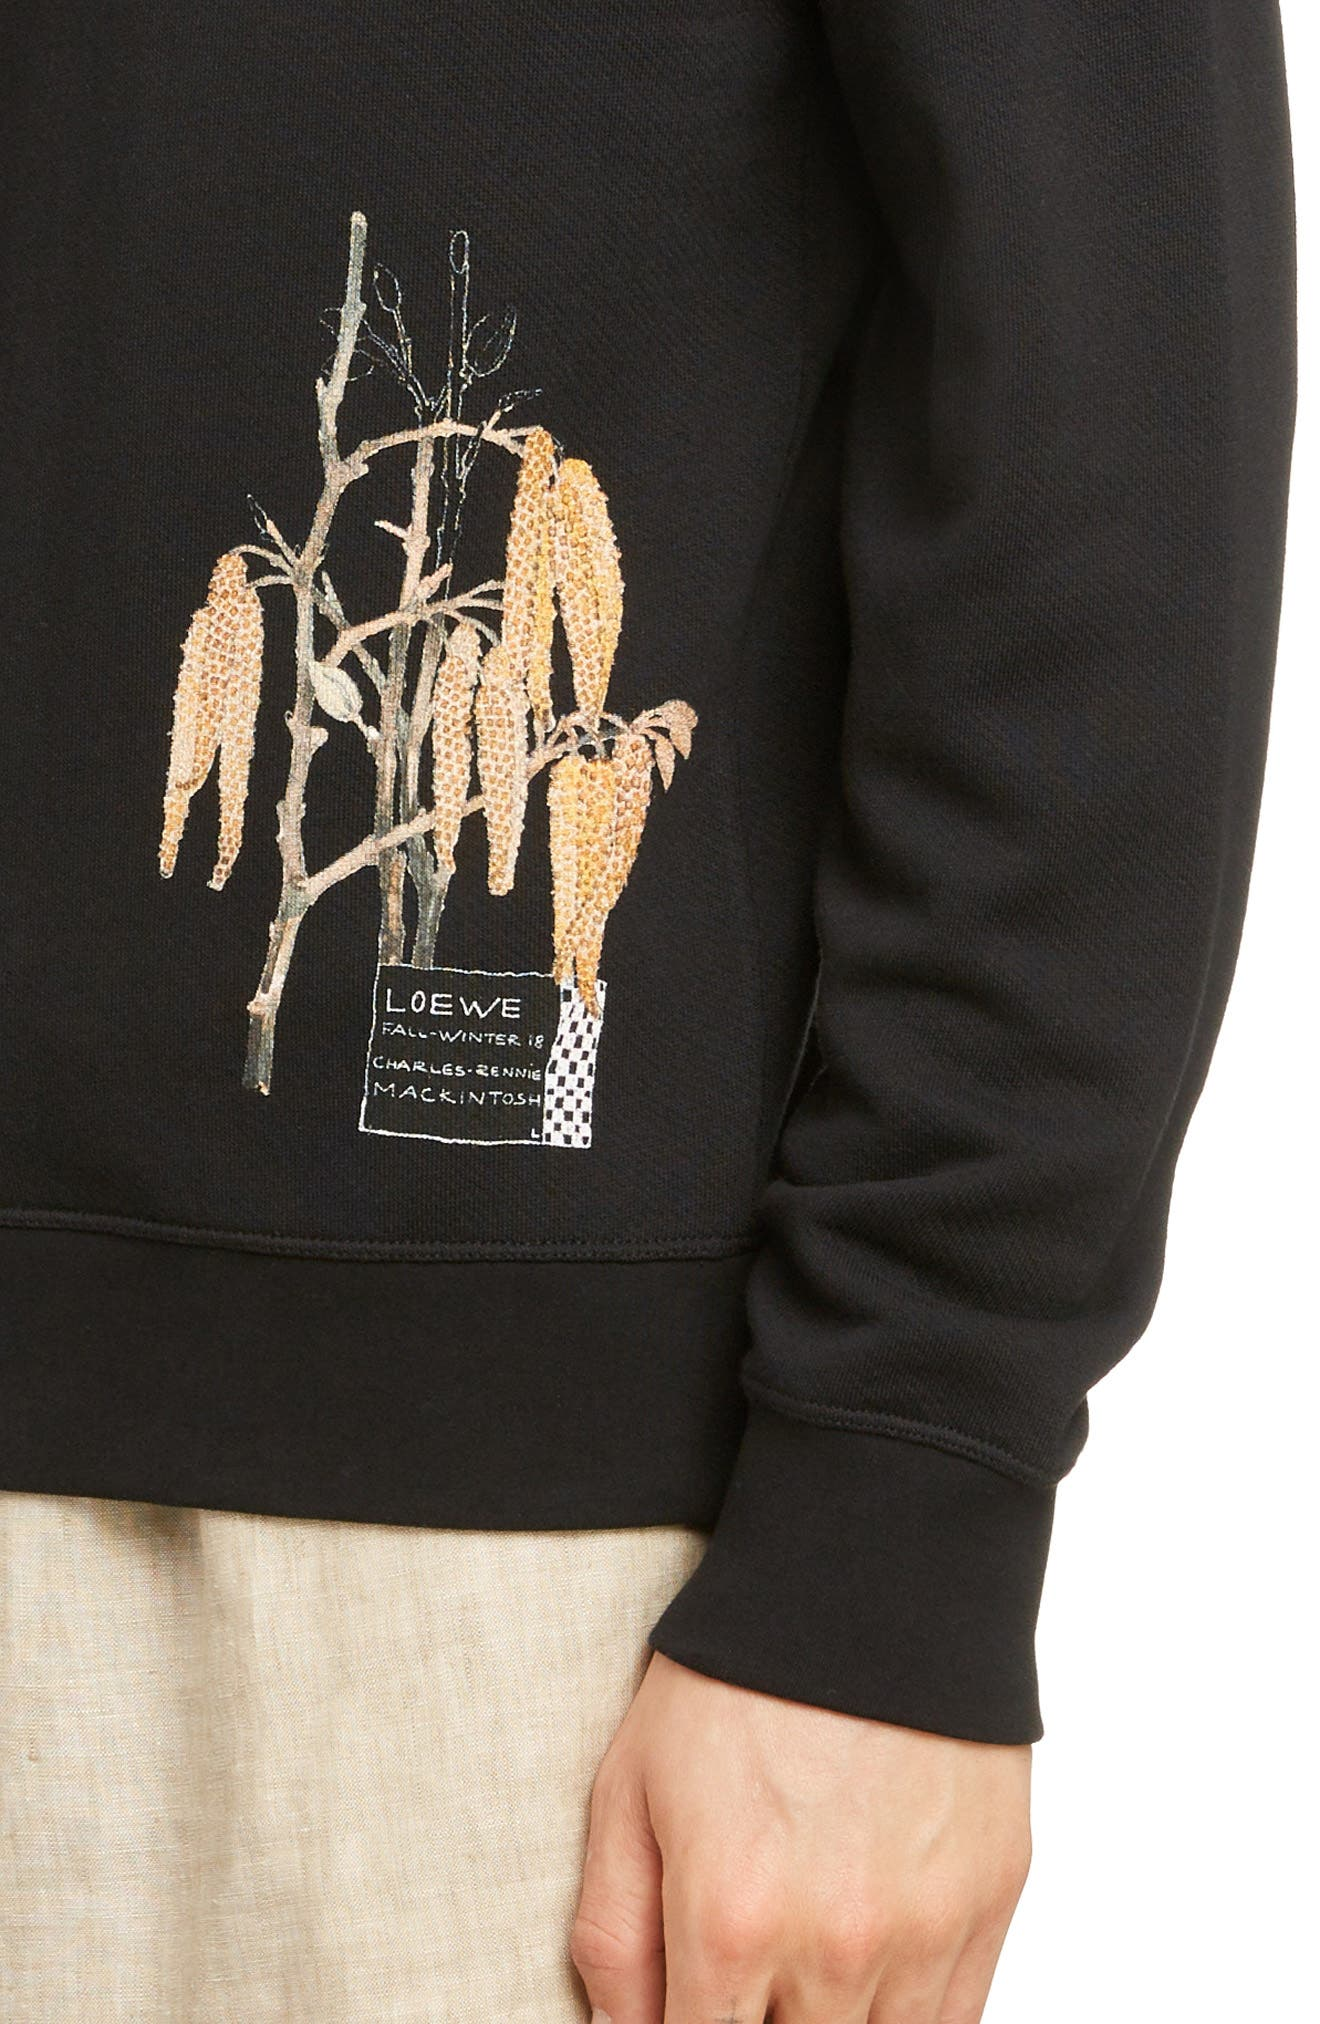 LOEWE, Charles Rennie Mackintosh Collection Botanical Print Sweatshirt, Alternate thumbnail 4, color, 1100-BLACK